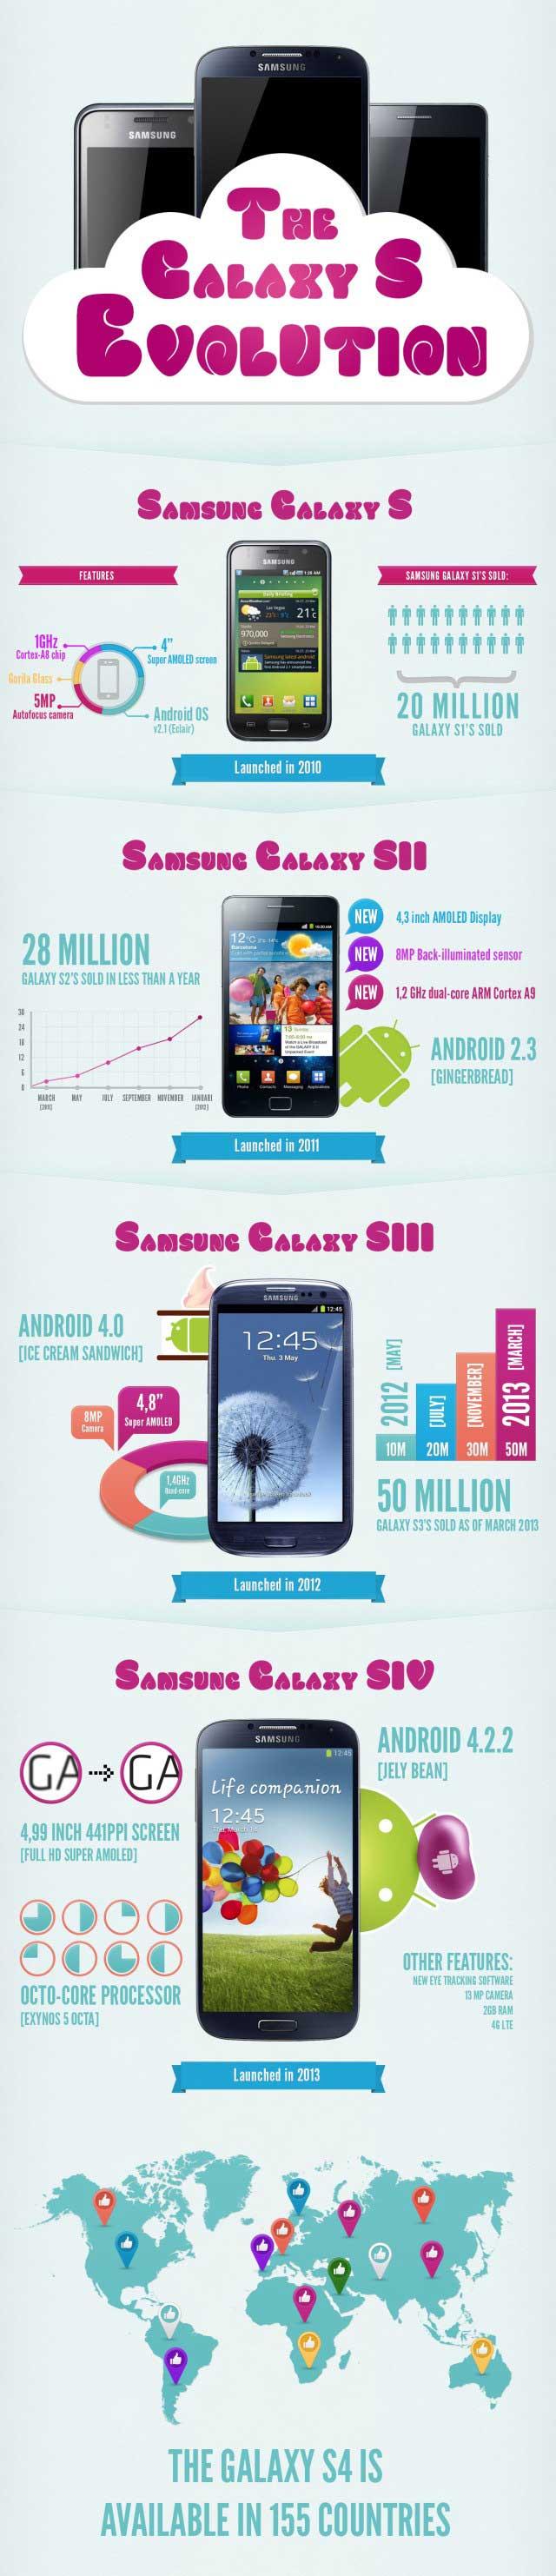 samsung-galaxy-s-evolution-infographic-1